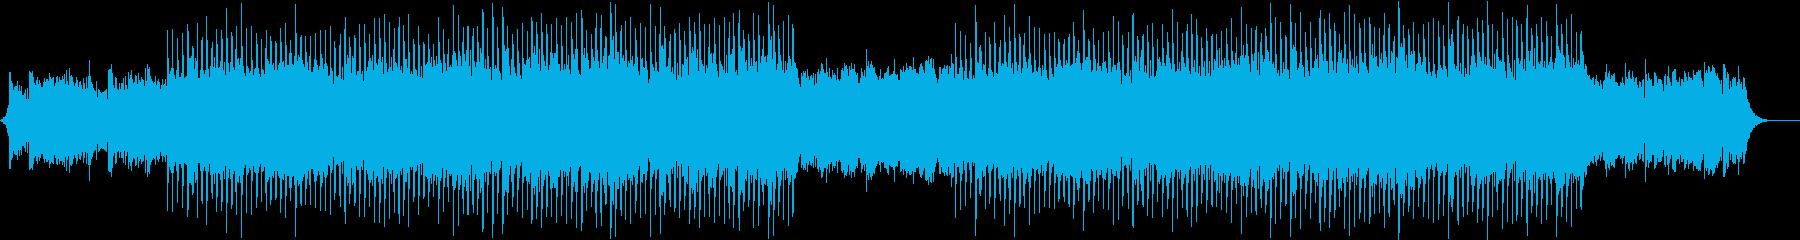 CM企業VPなどのオープニング系BGMの再生済みの波形